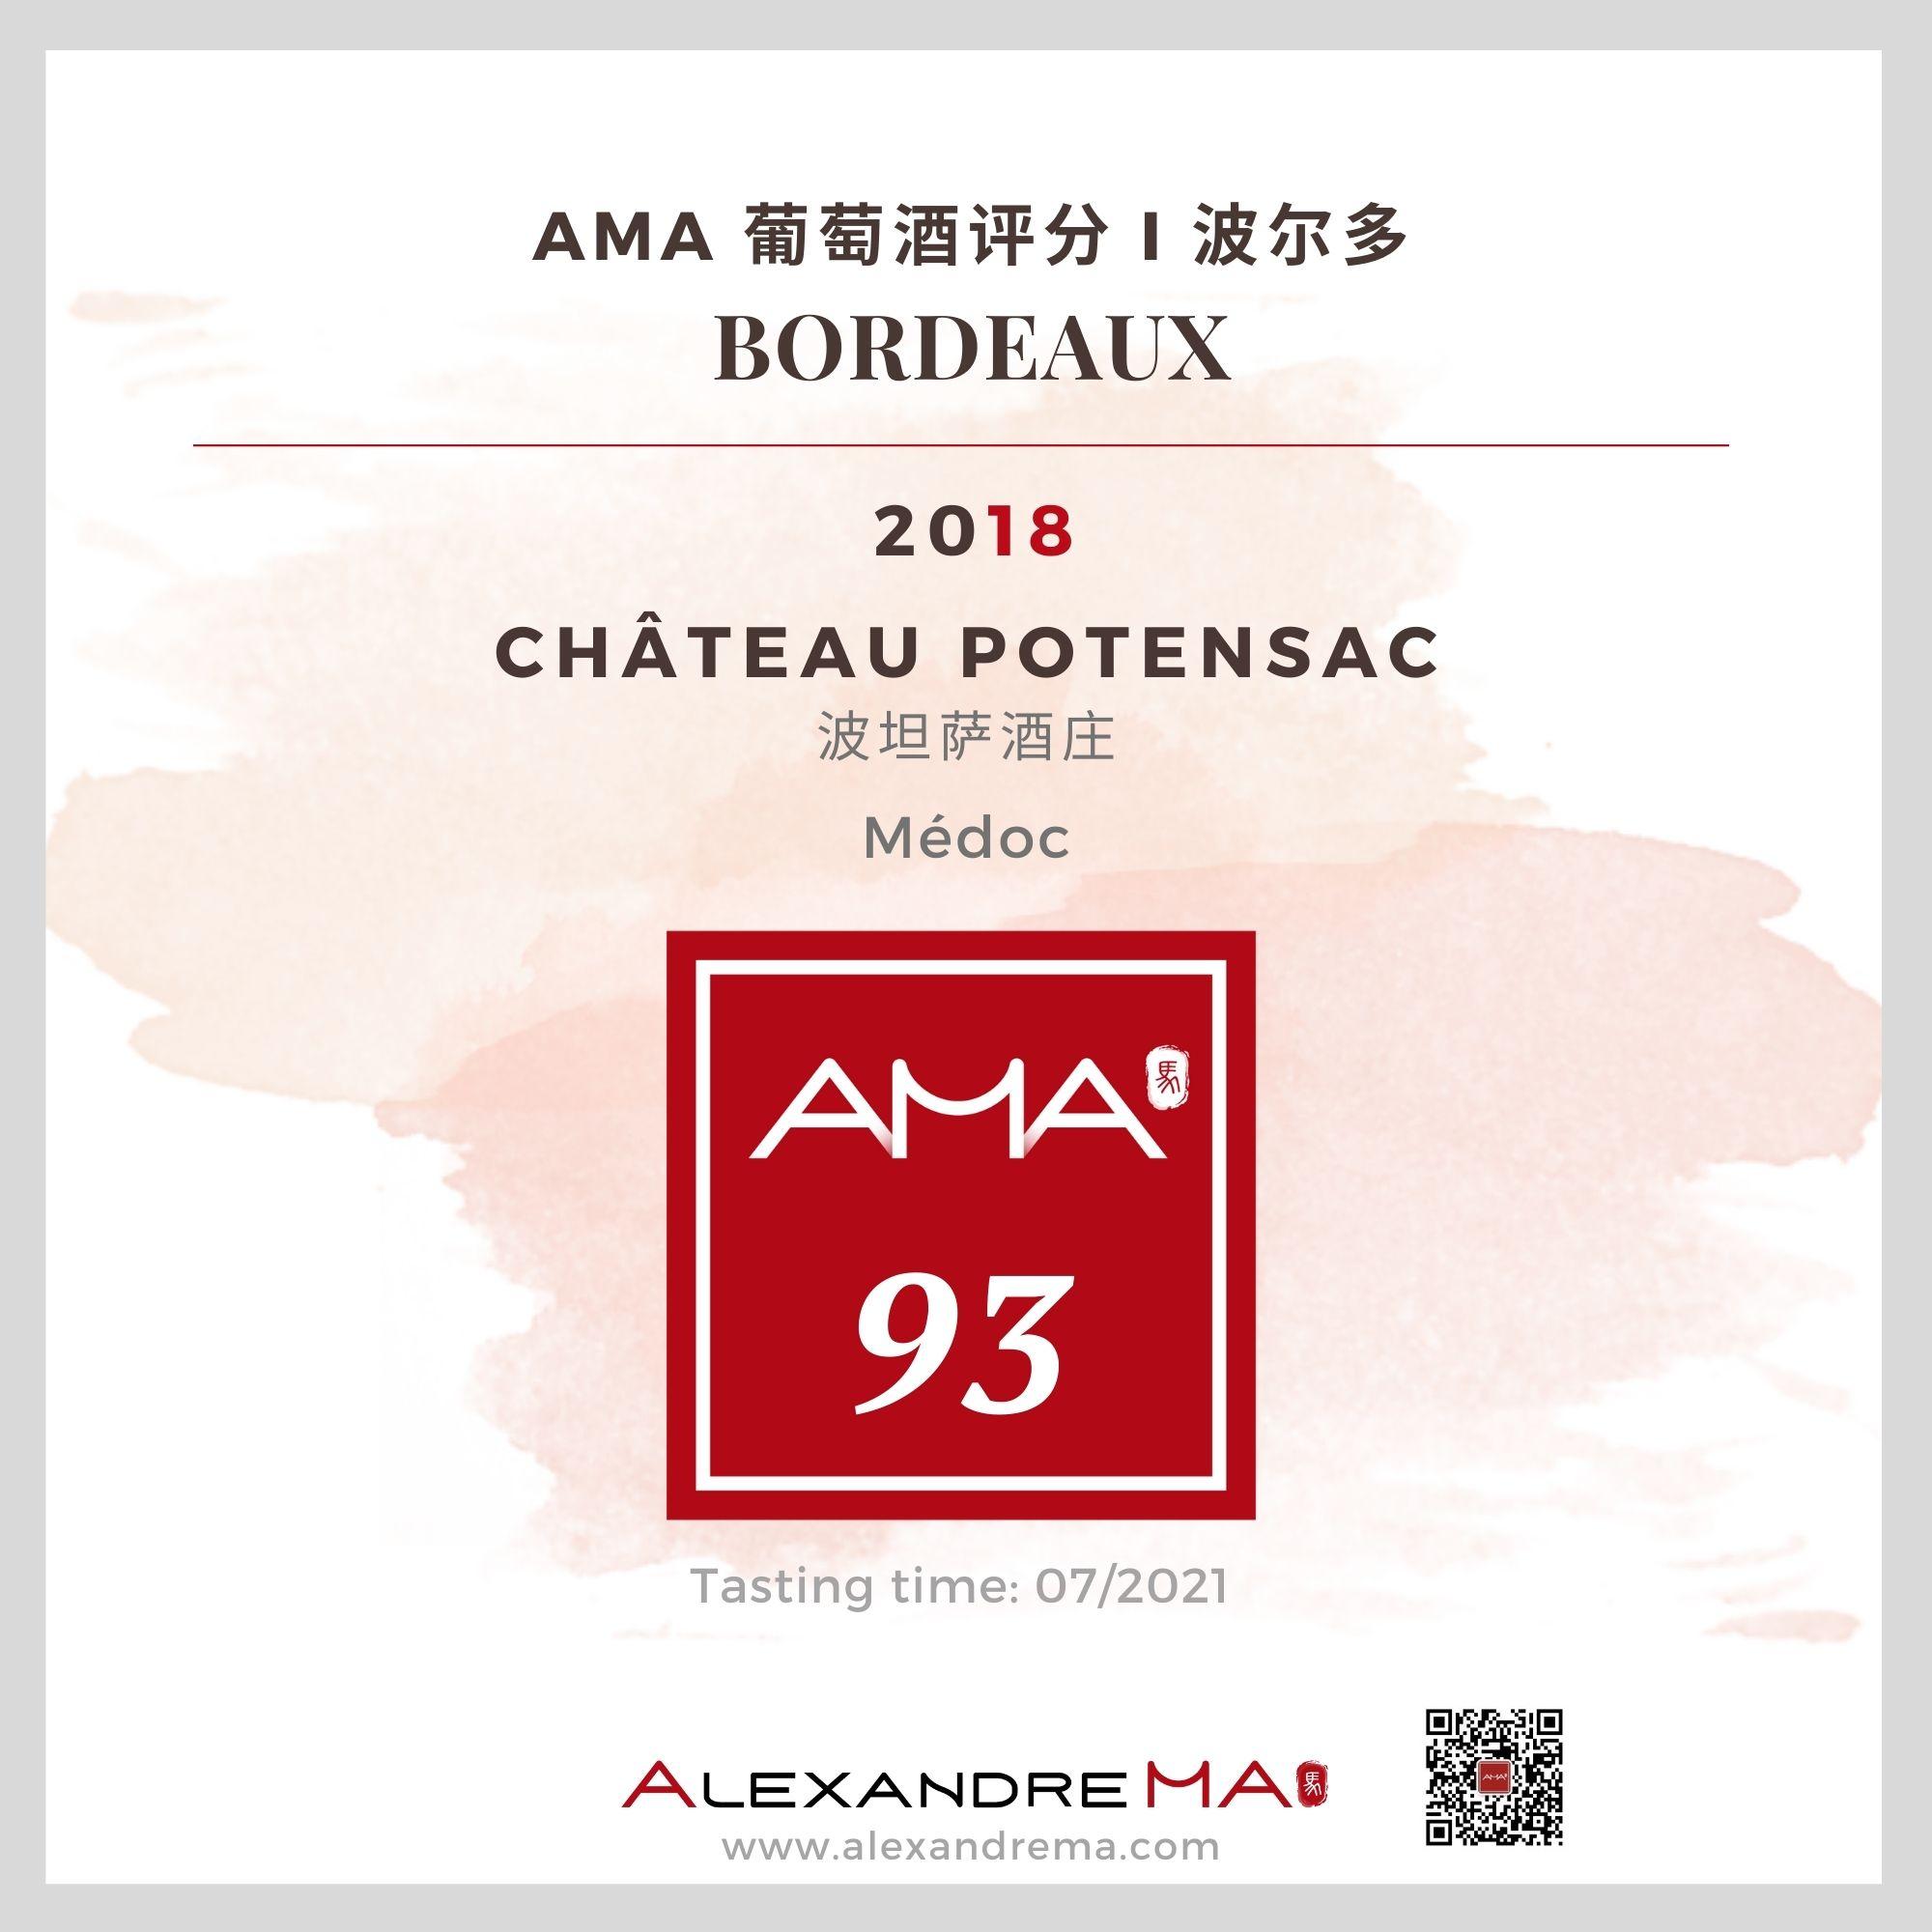 Château Potensac 2018 波坦萨酒庄 - Alexandre Ma